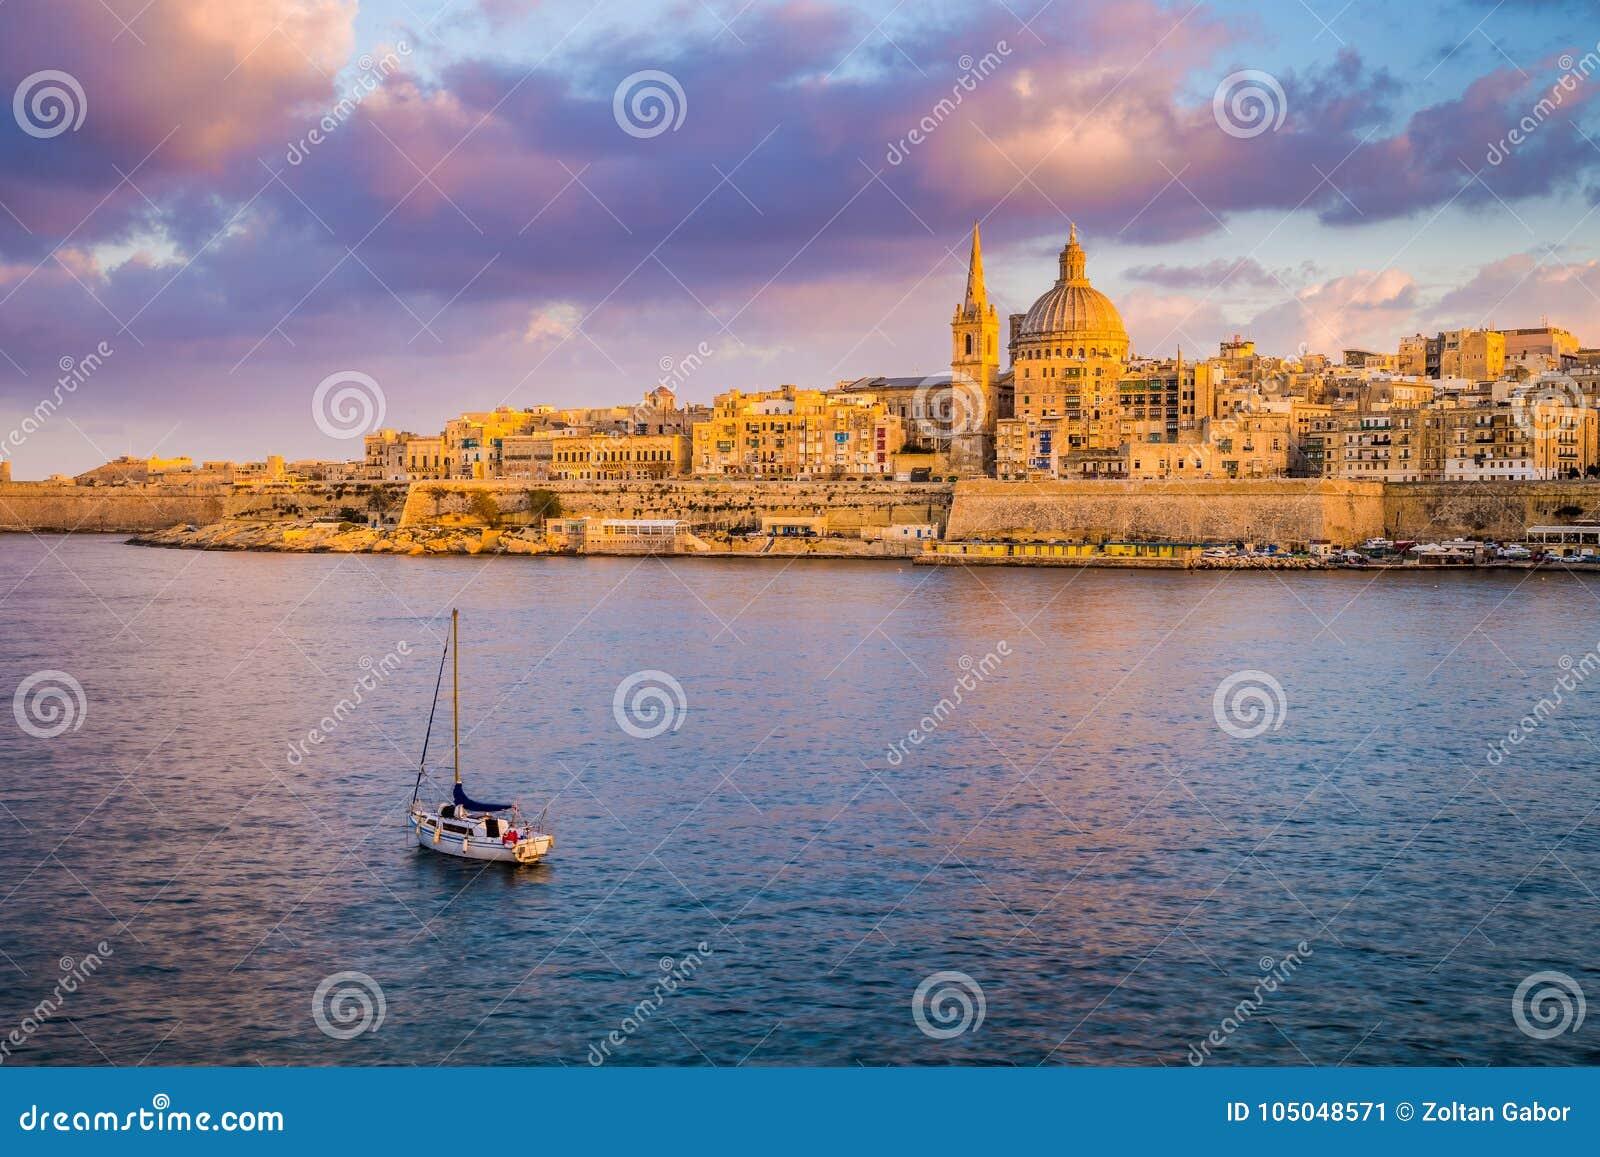 Catedral do ` s de Valletta, Malta - de StPaul na hora dourada no capital Valletta do ` s de Malta com veleiro e o céu colorido b